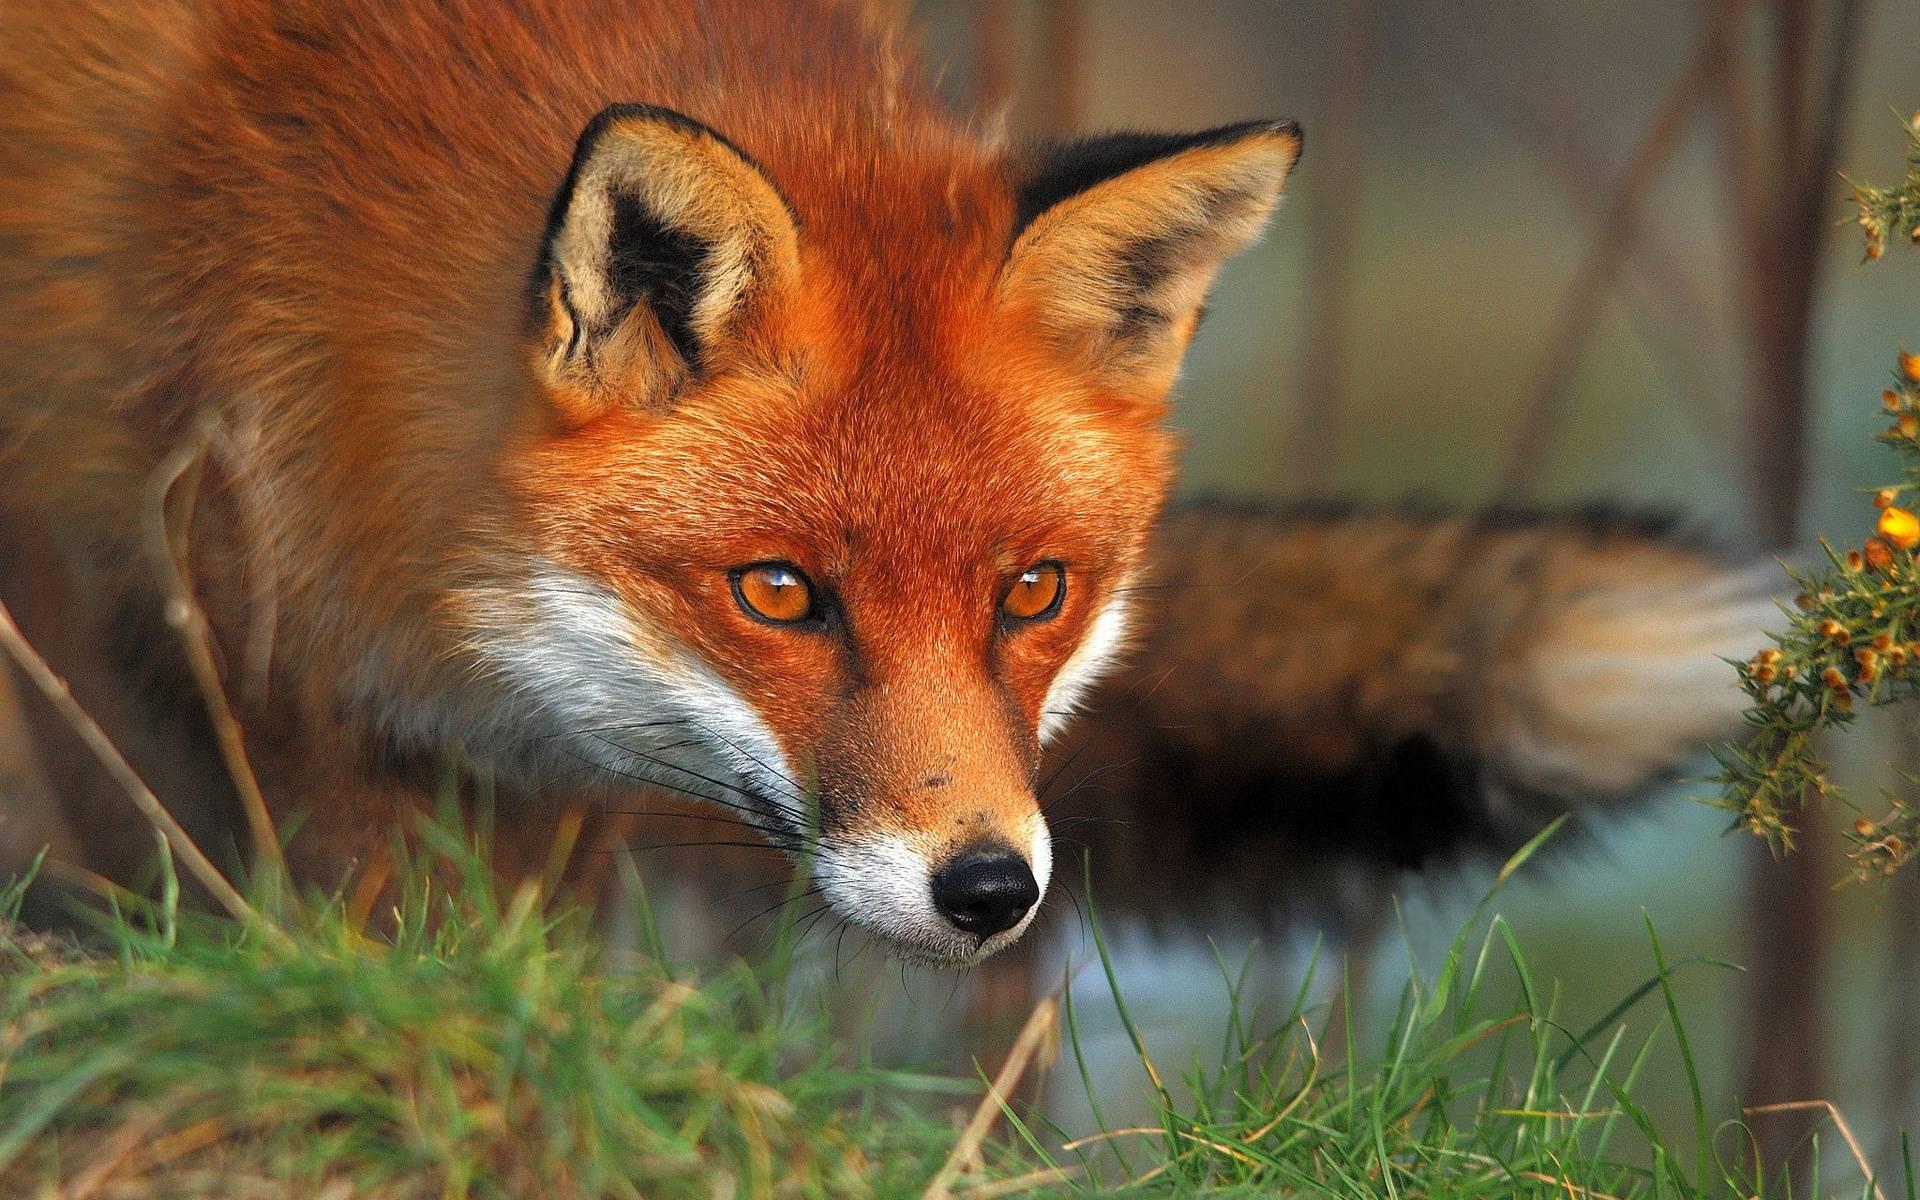 Red Fox Wallpapers - HD Wallpapers Inn